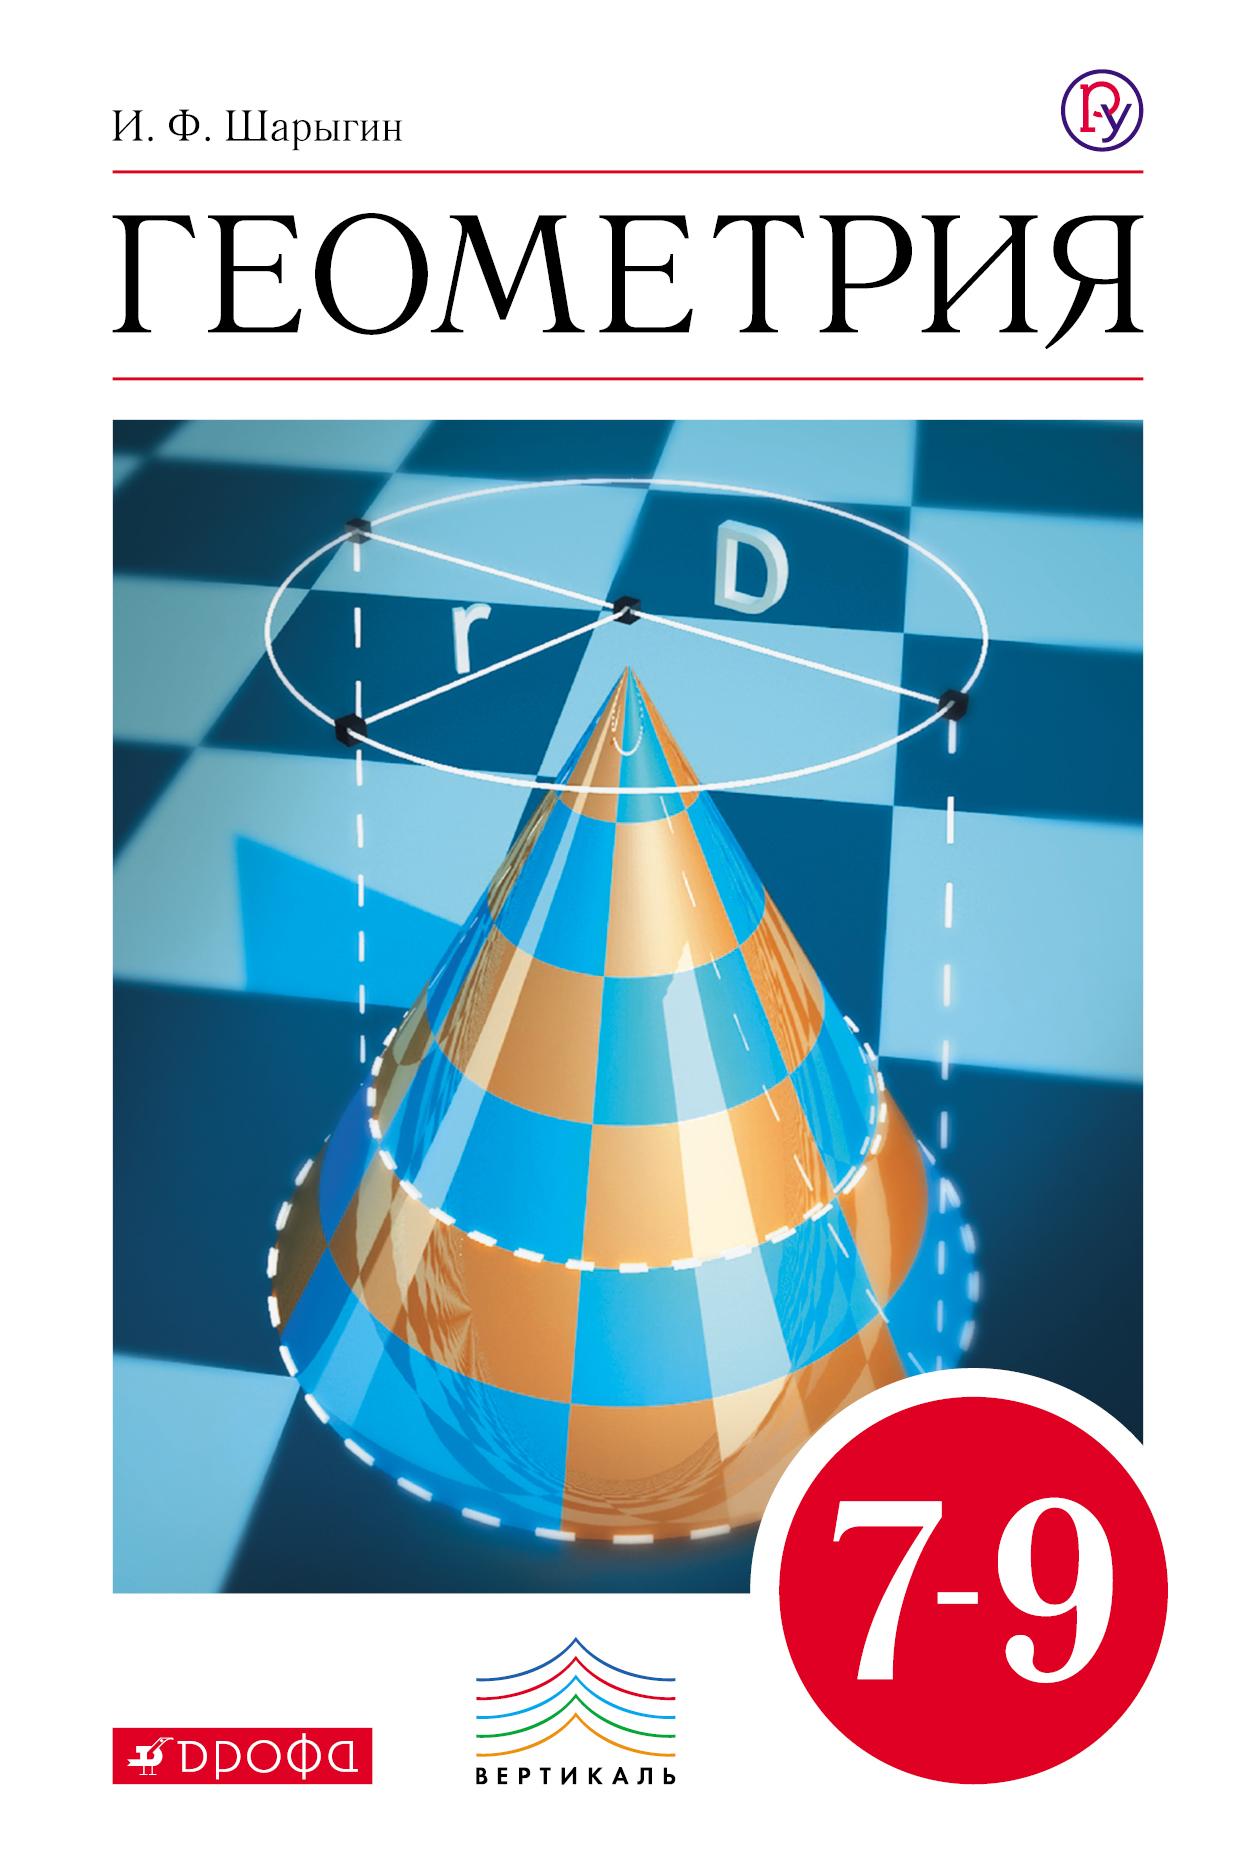 Геометрия. 7-9 кл. Учебник. ВЕРТИКАЛЬ